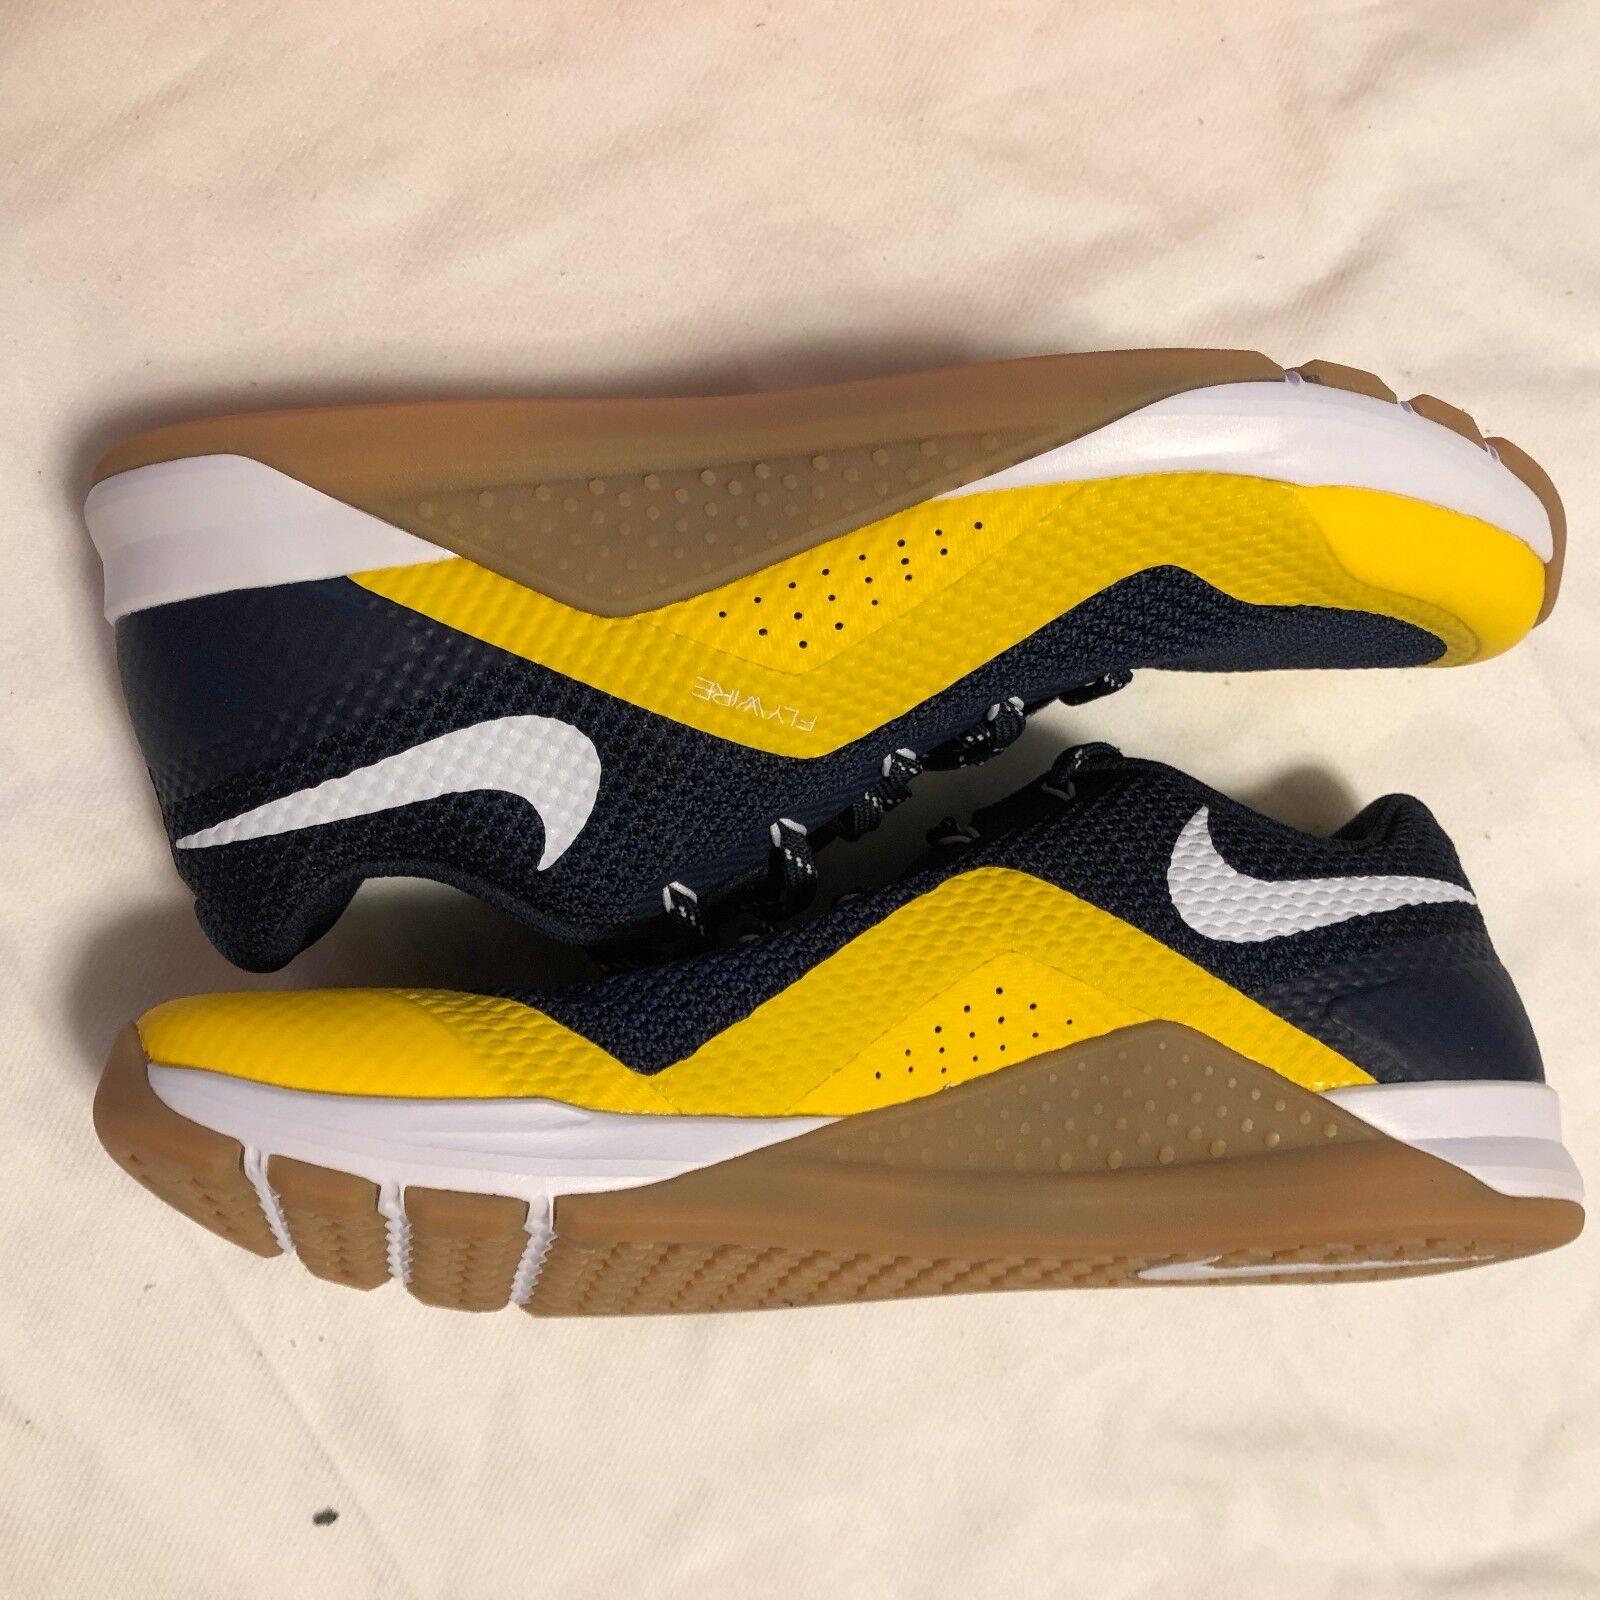 NEW NIKE METCON Repper DSX College 921215 402  MICHIGAN Go Blue NO BOX TOP  Cheap women's shoes women's shoes